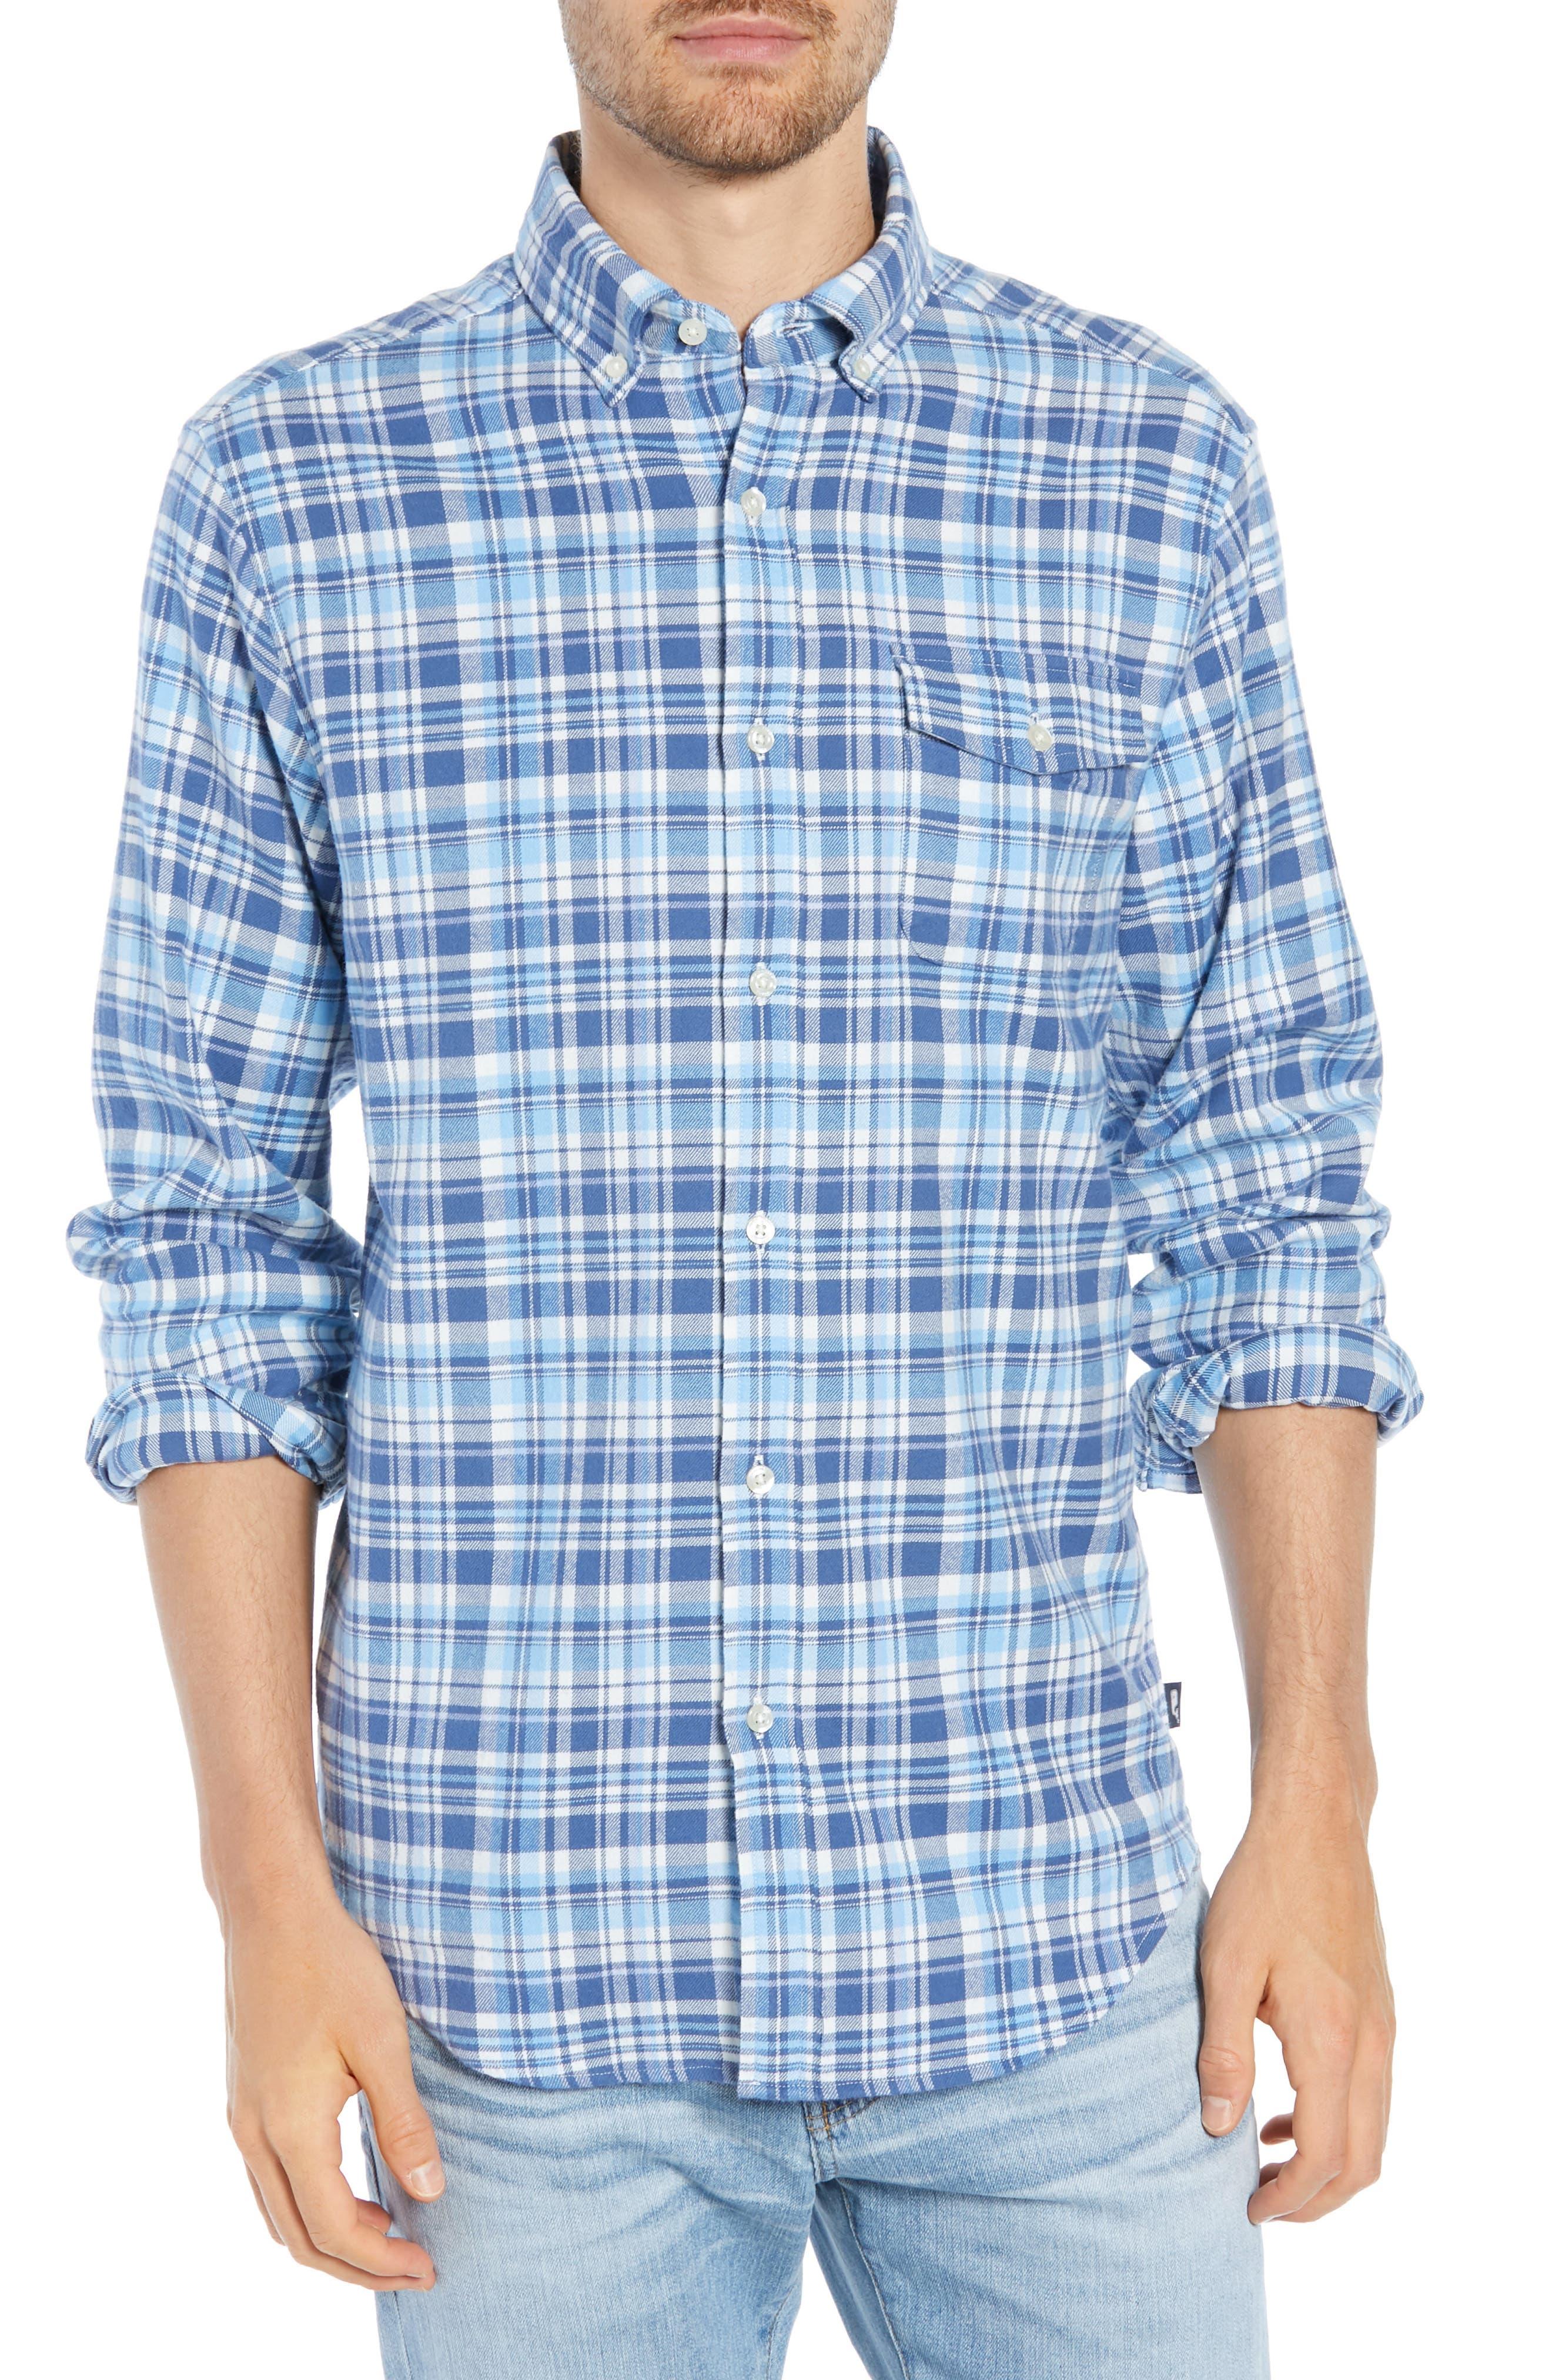 Mill Hill Regular Fit Plaid Flannel Shirt,                         Main,                         color, MOONSHINE